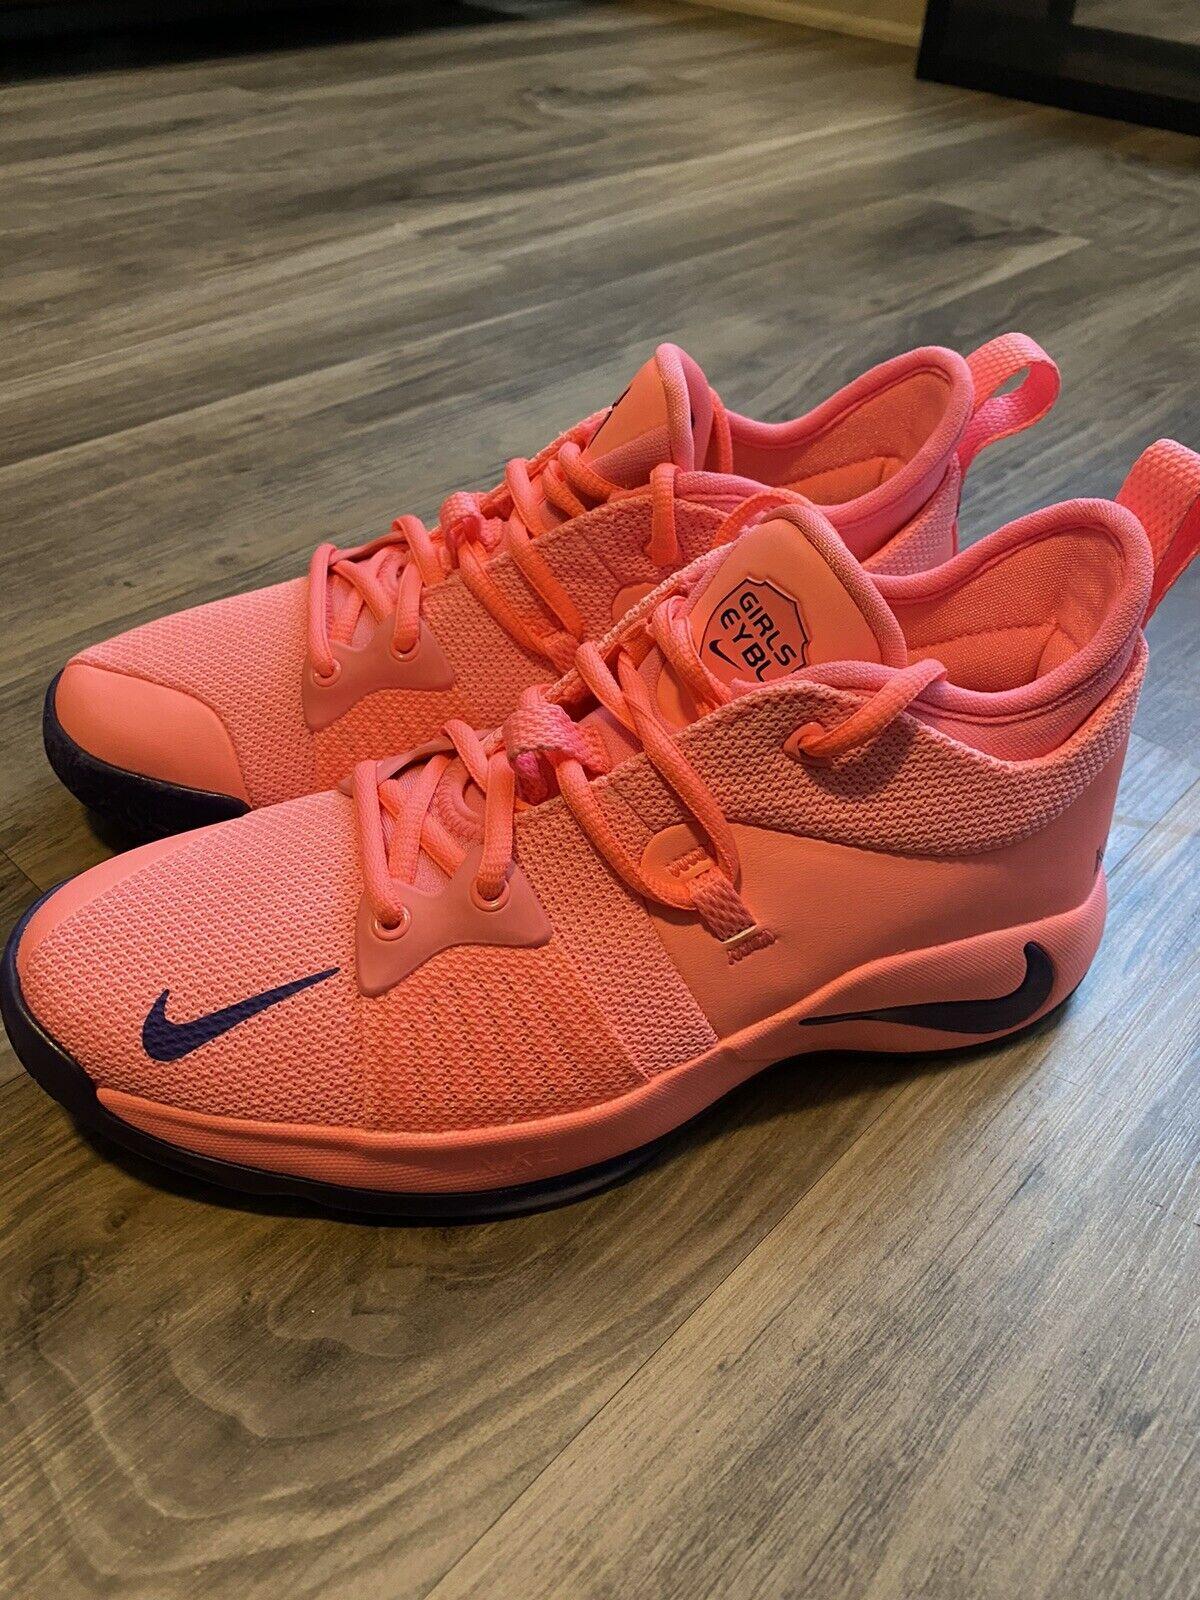 Nike PG 2 GEYBL Sunset Pulse Fusion